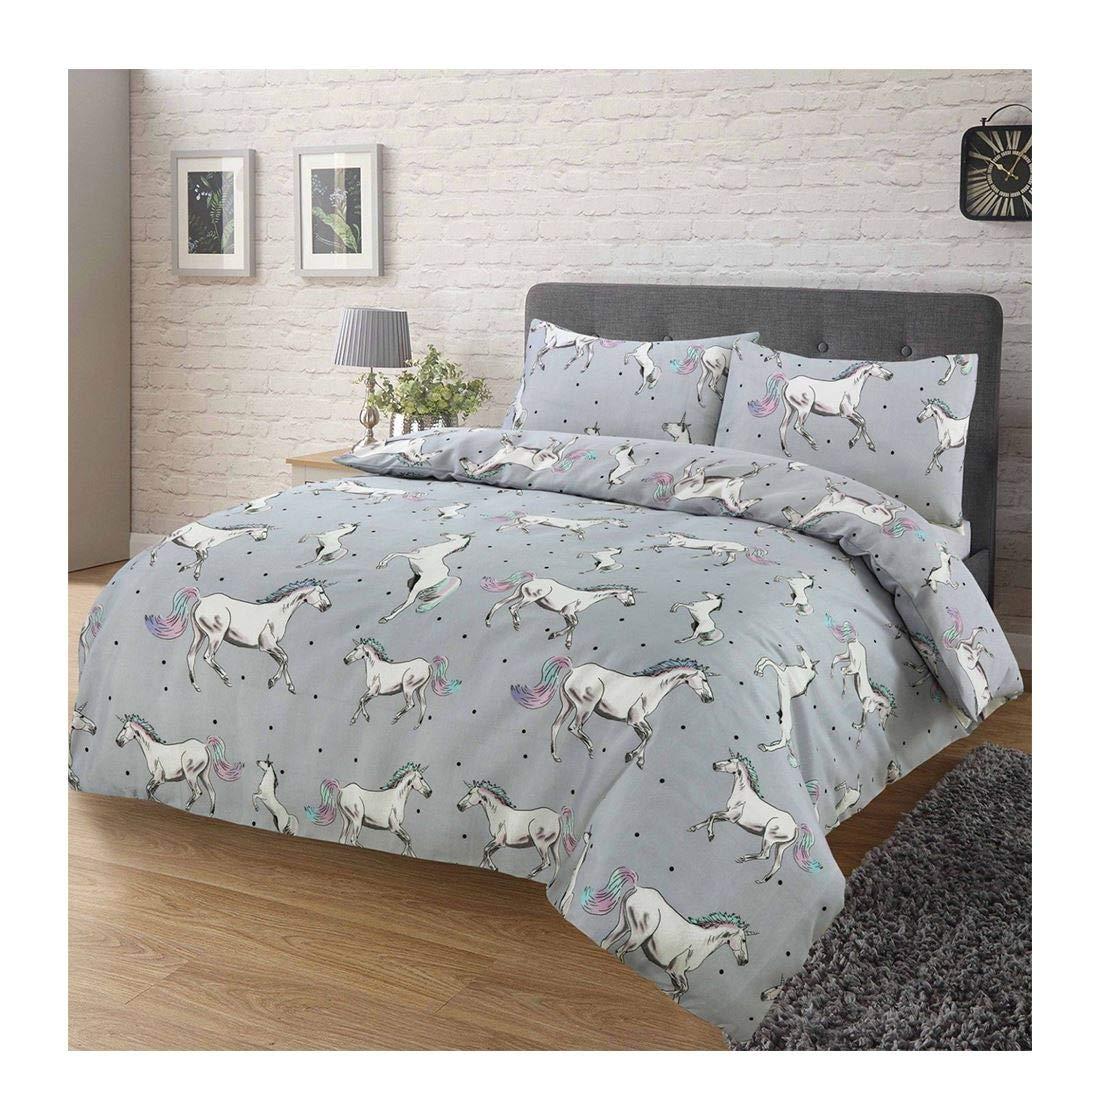 Soft Comfortable Katie Flamingo Li Corn Copenhagen Print Duvet Cover Bedding Set Copenhagen Mustard//Grey Double Size